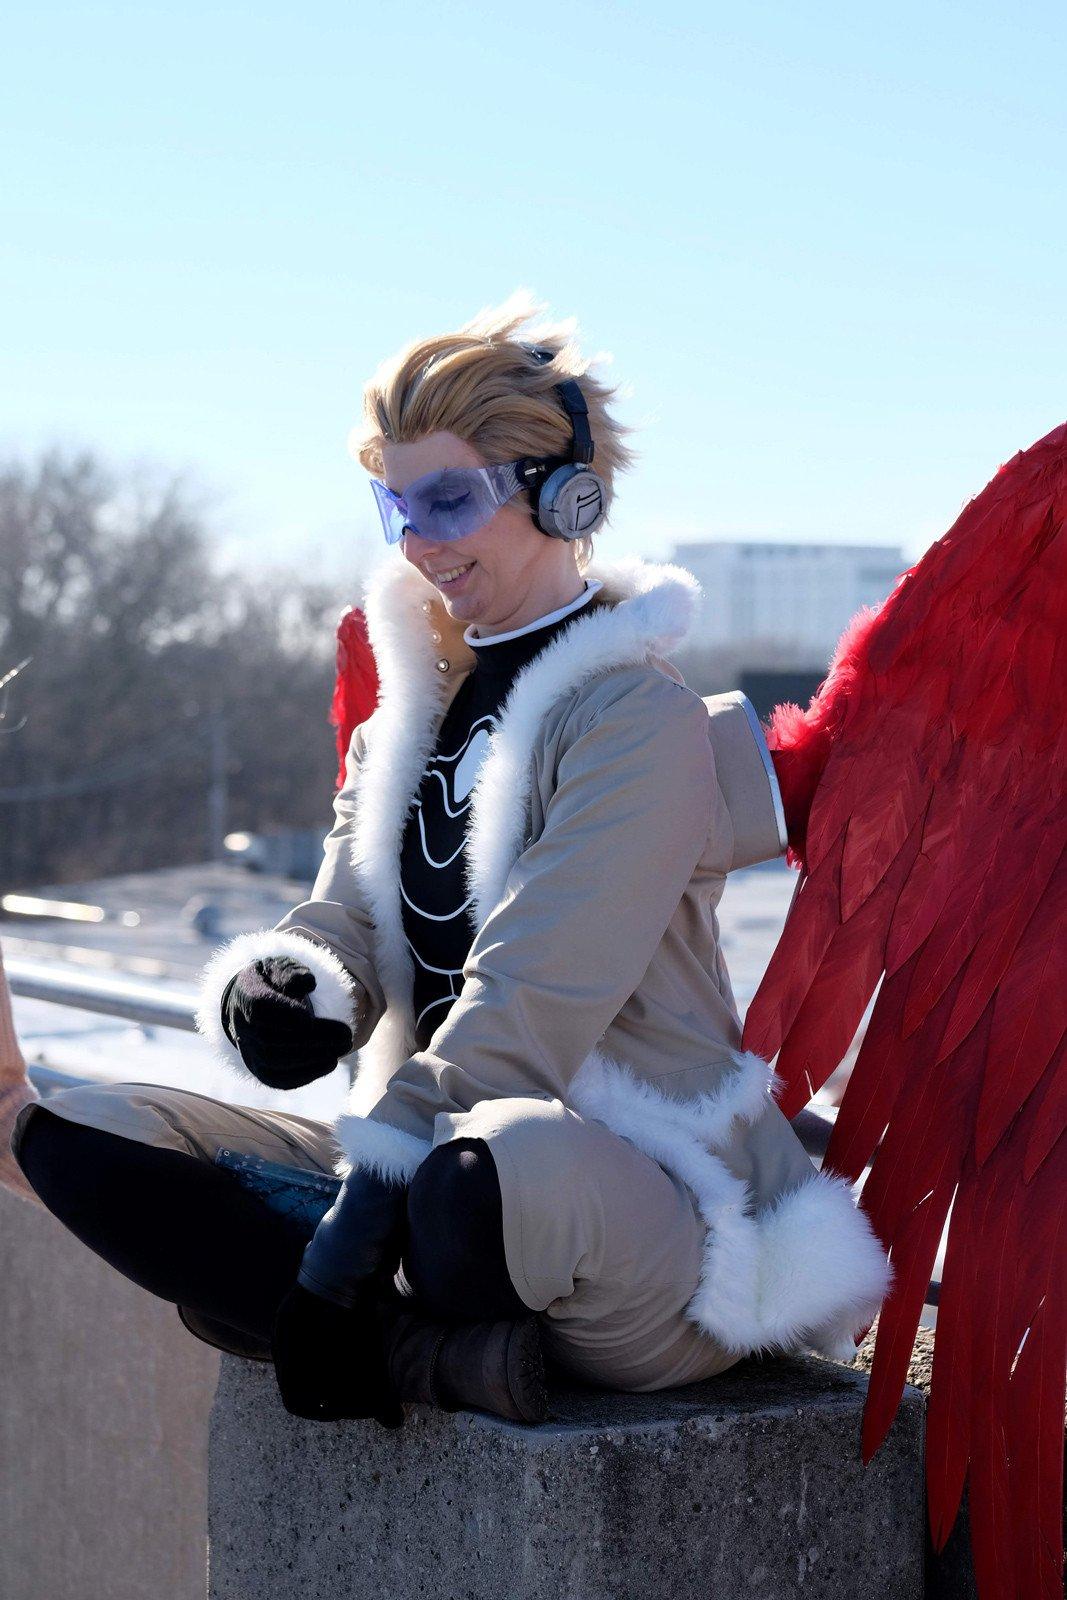 Hawks - My Hero Academia cosplay by SailorAnime - Cosplay.com